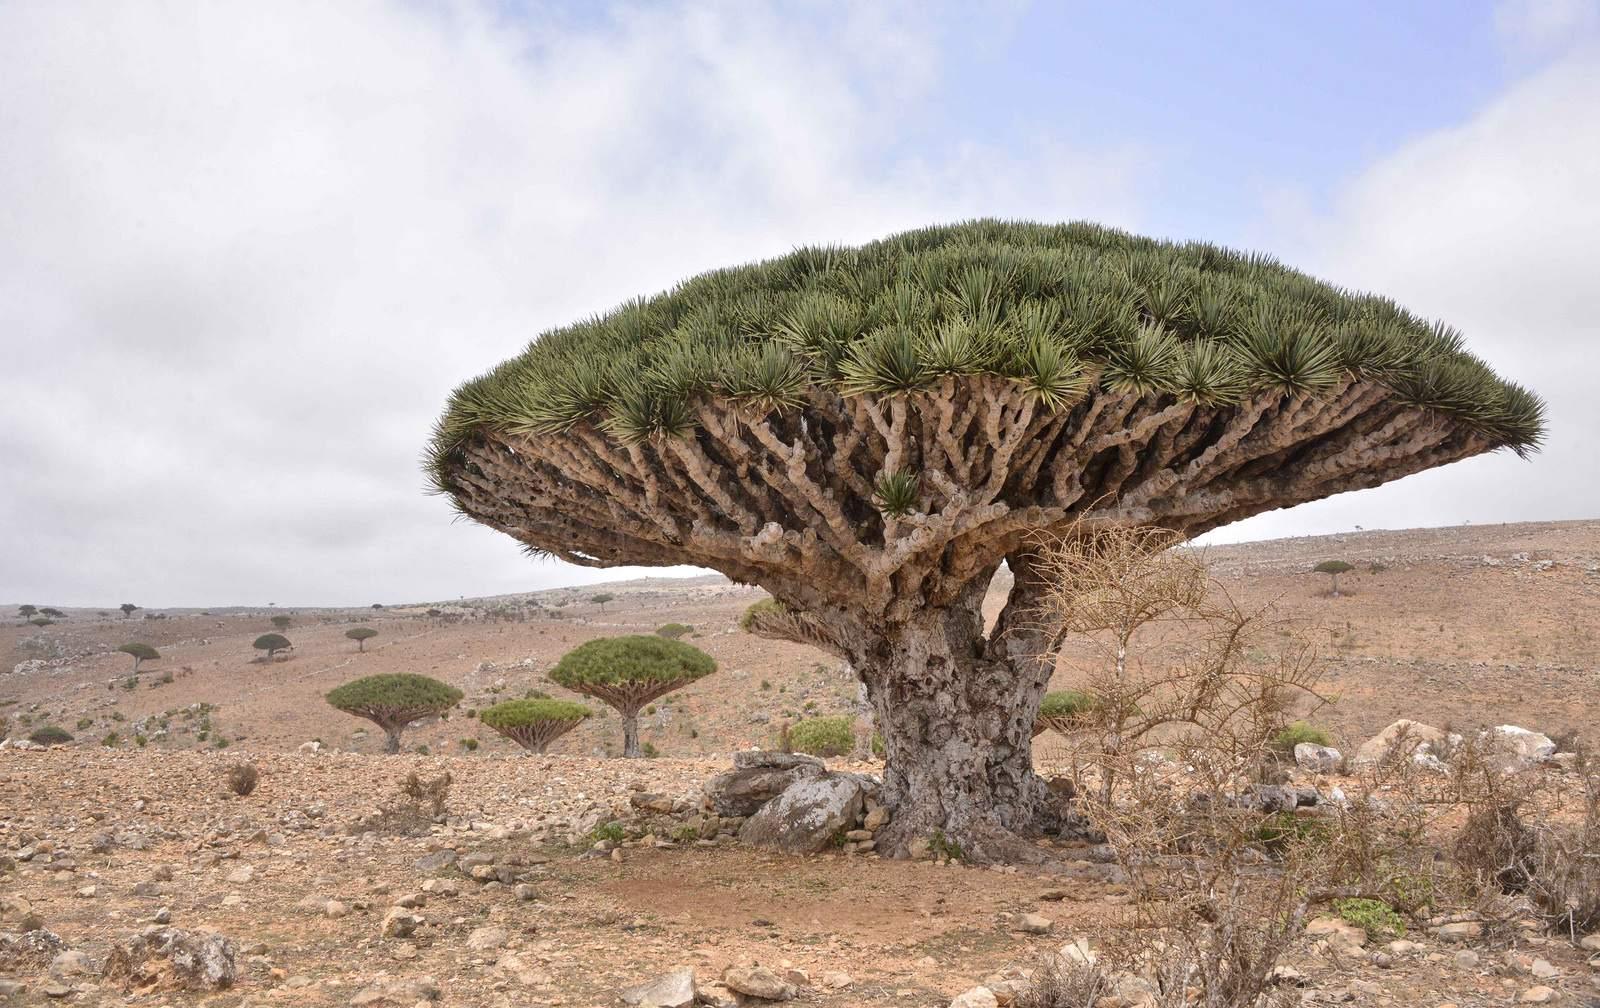 socotra2 Dragons Blood Tree at Socotra Island, Yemen